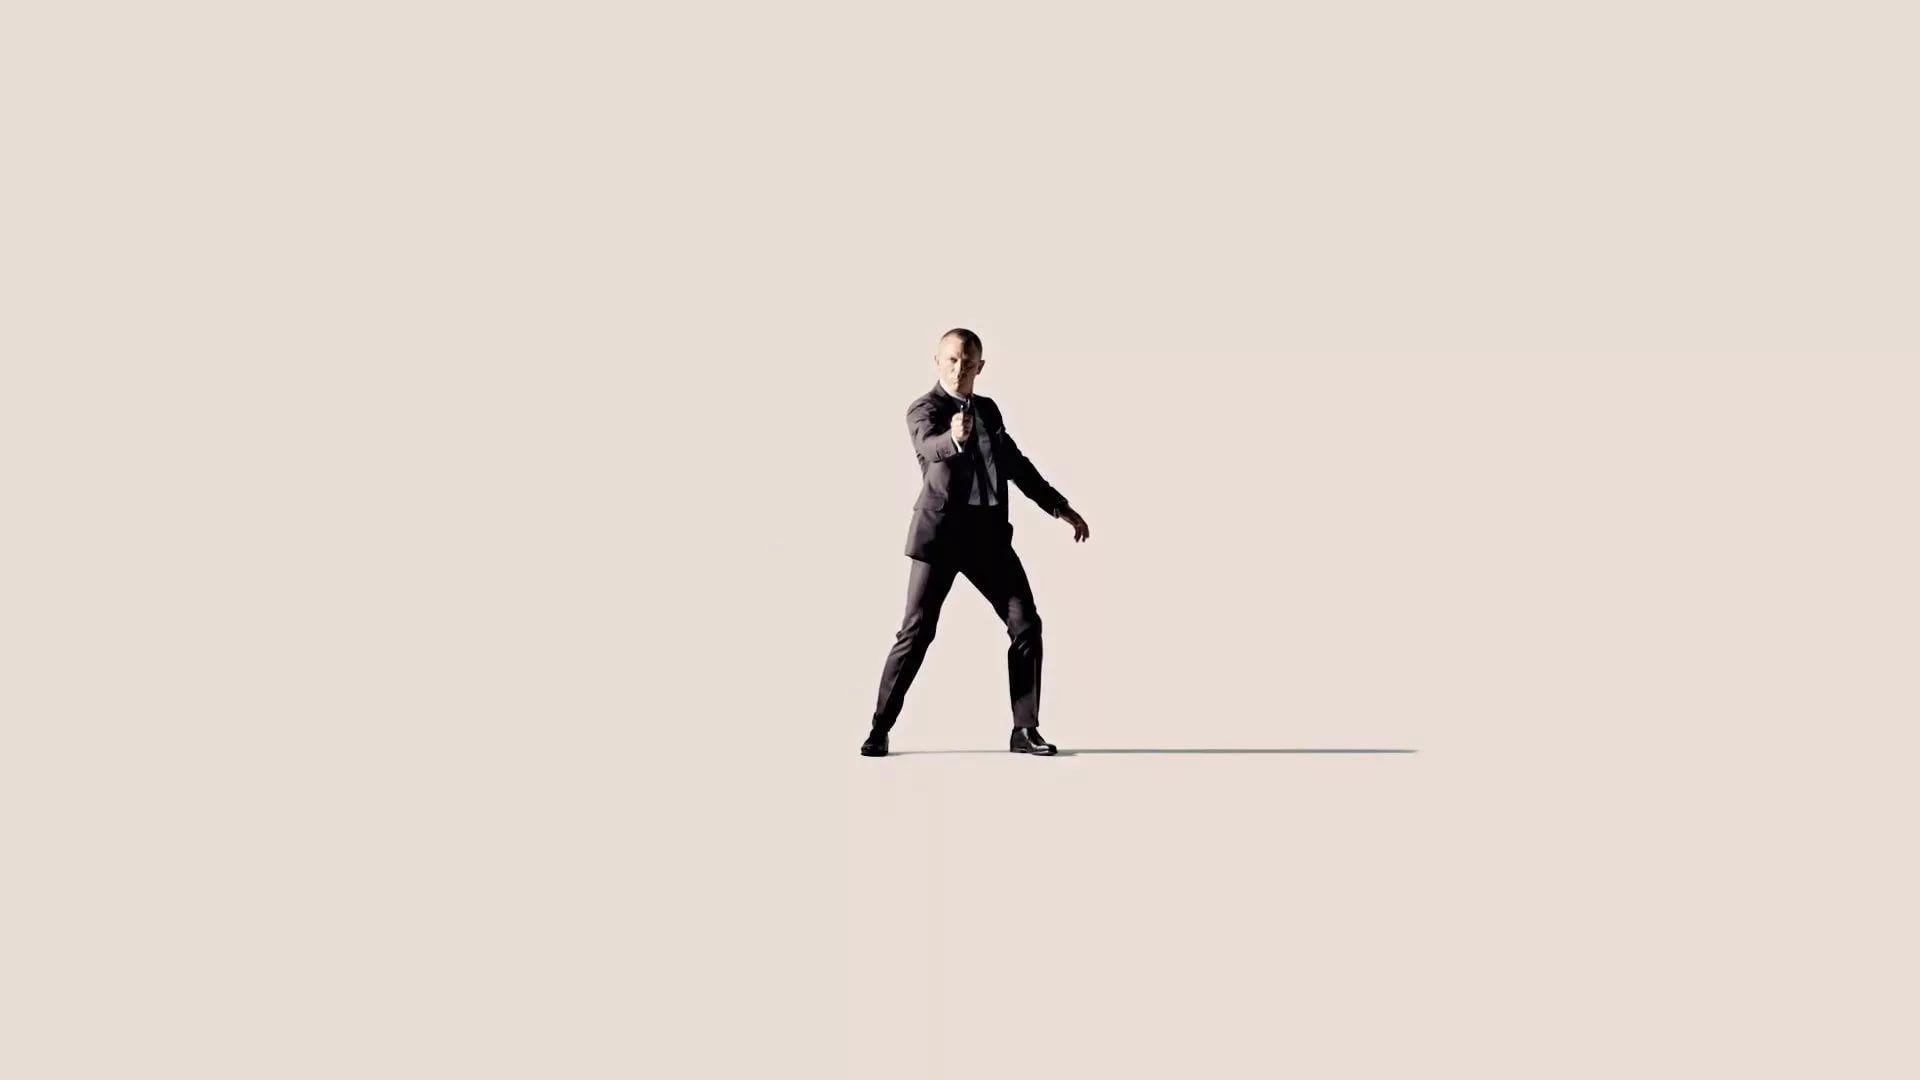 James Bond wallpaper photo